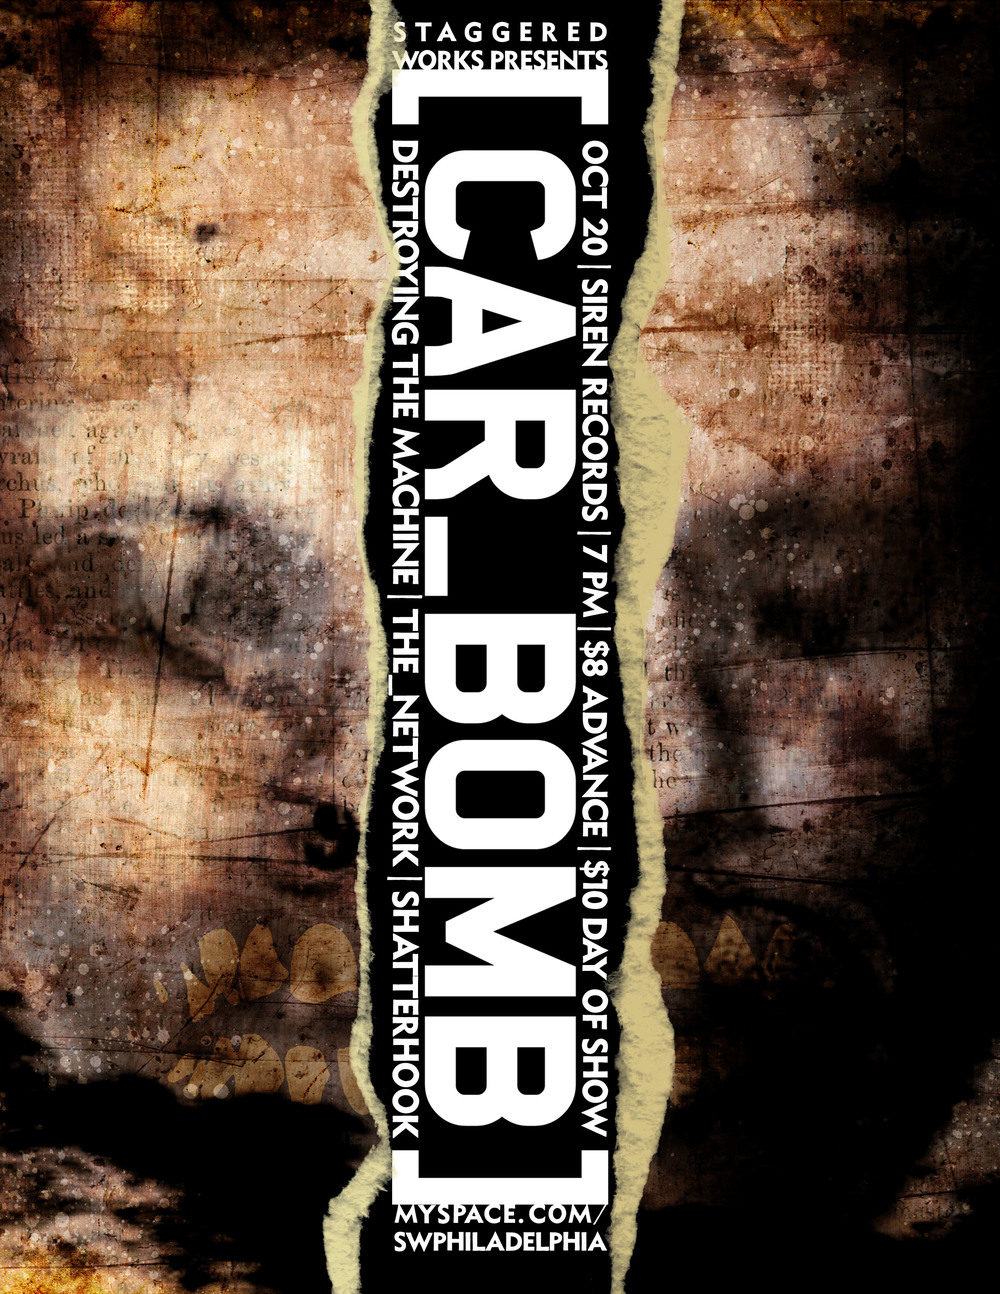 carbombflyerhighres.jpg